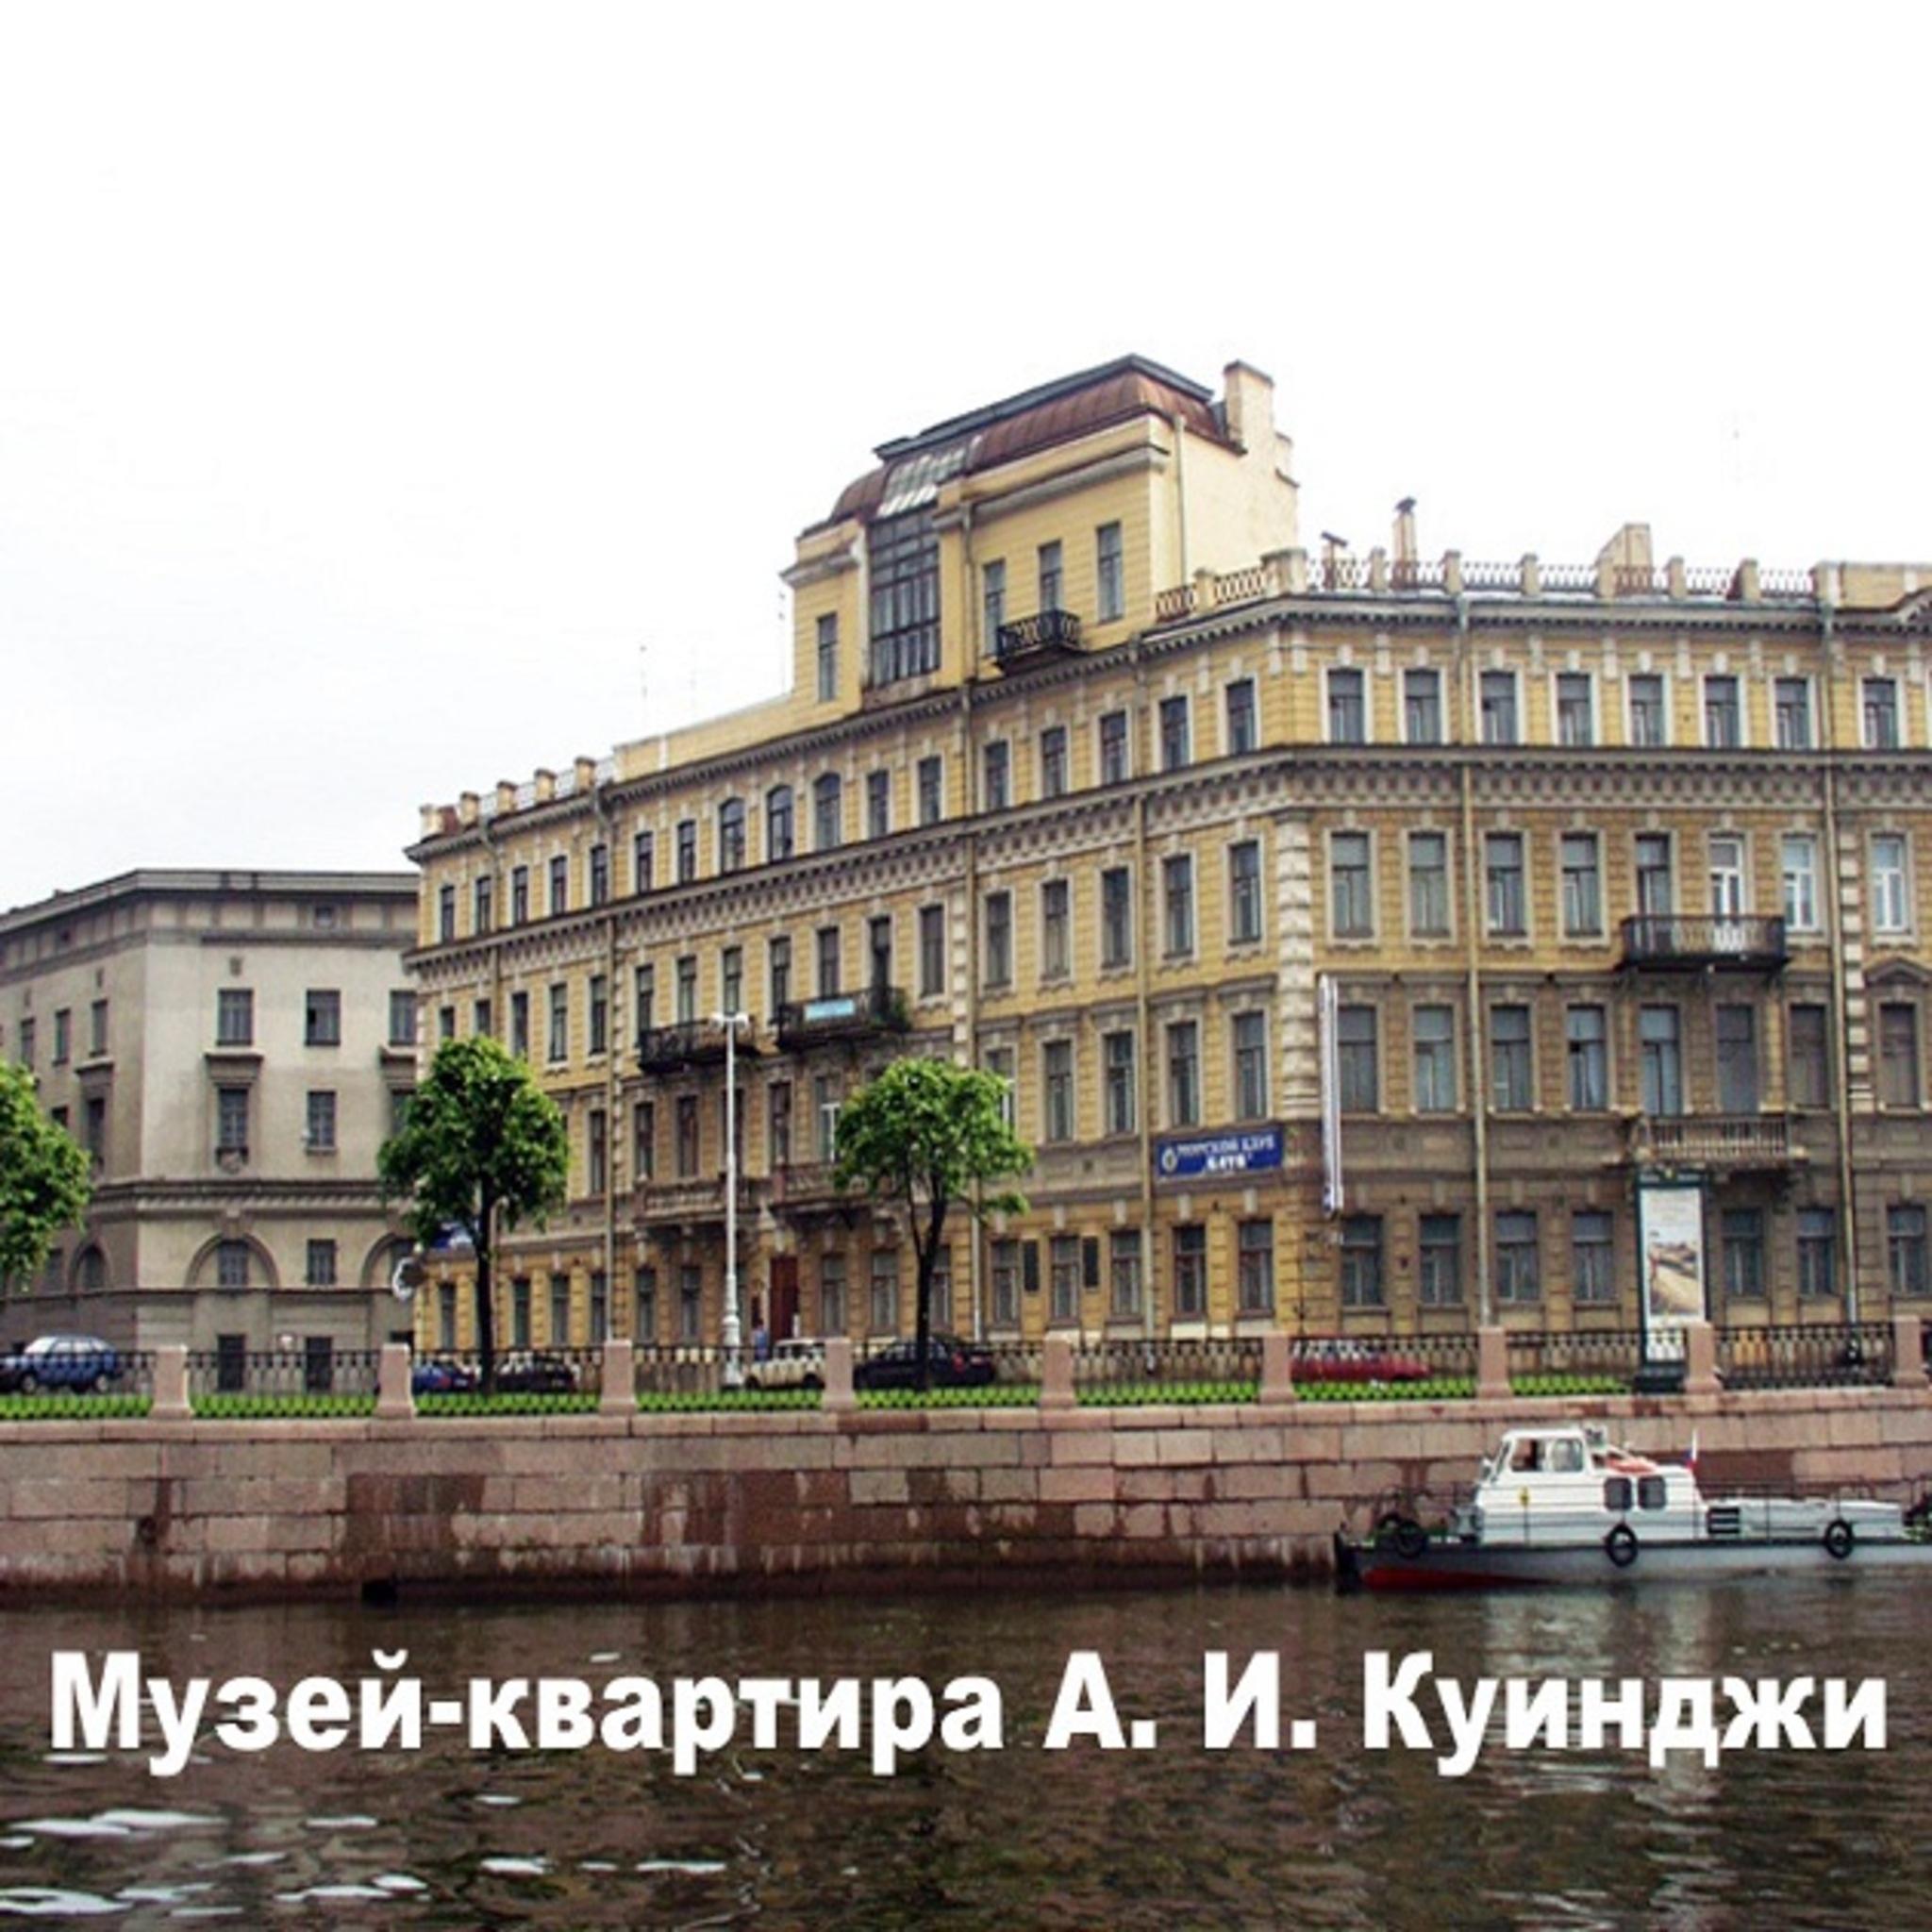 Apartment Museum A. I. Kuindzhi